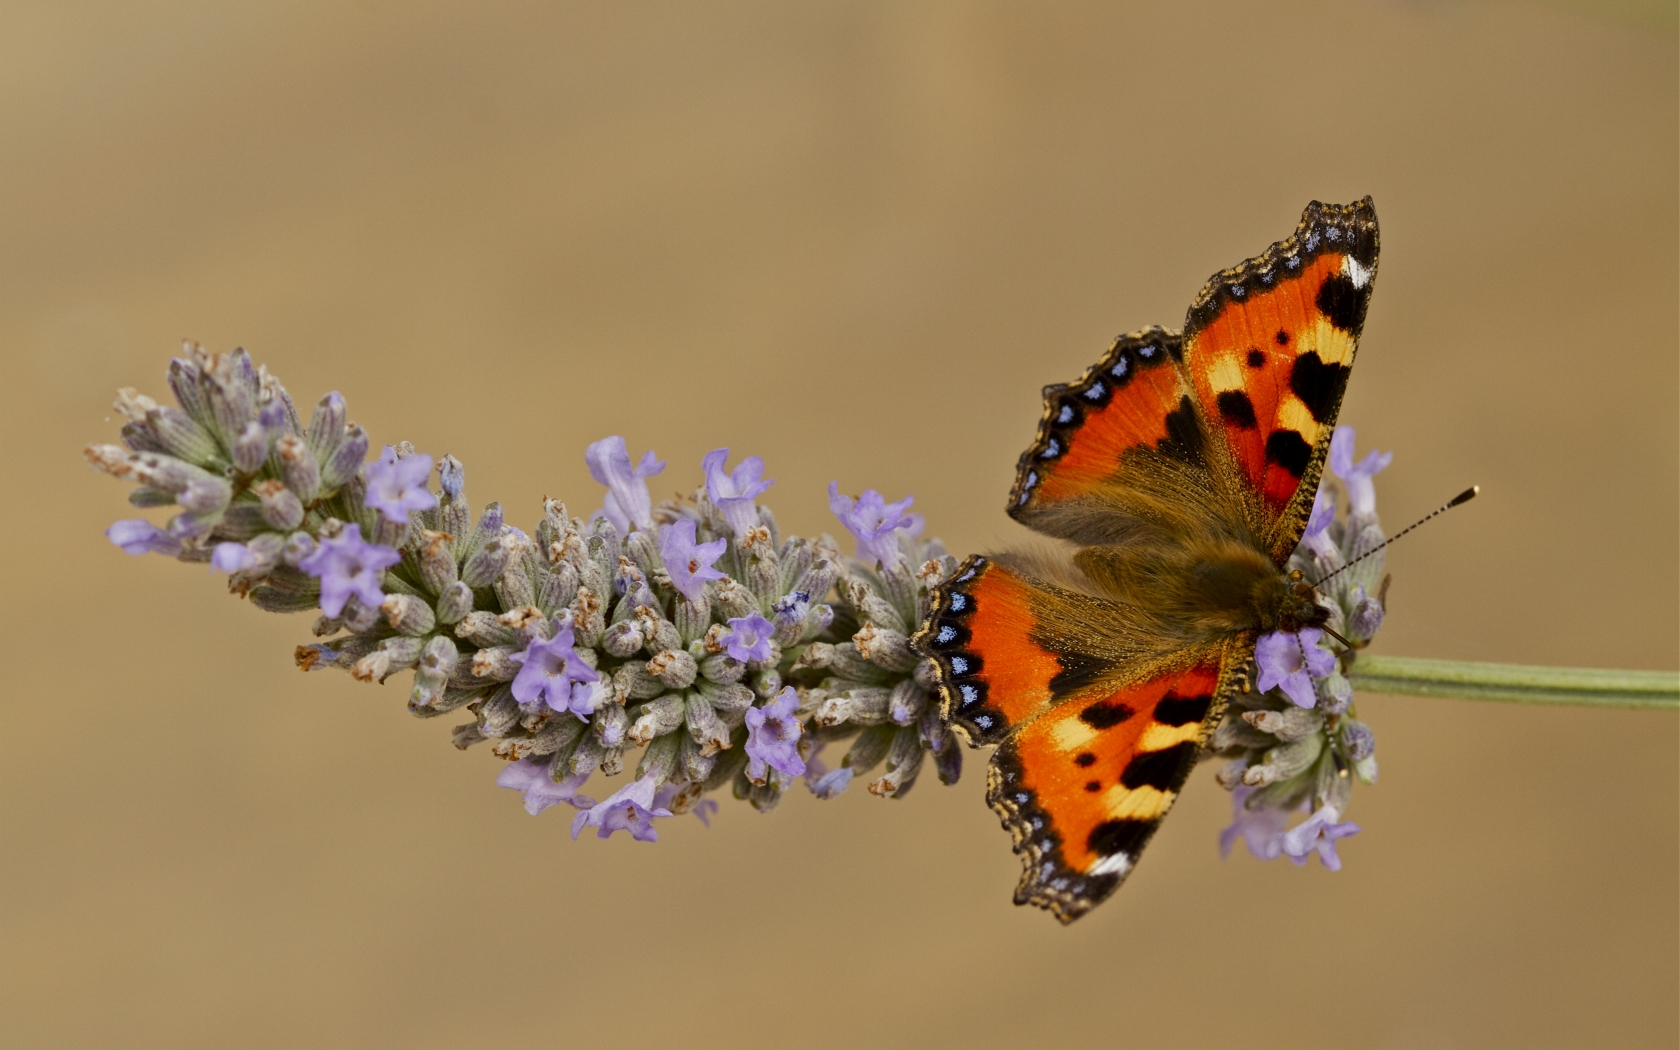 Mariposa color Naranja - 1680x1050